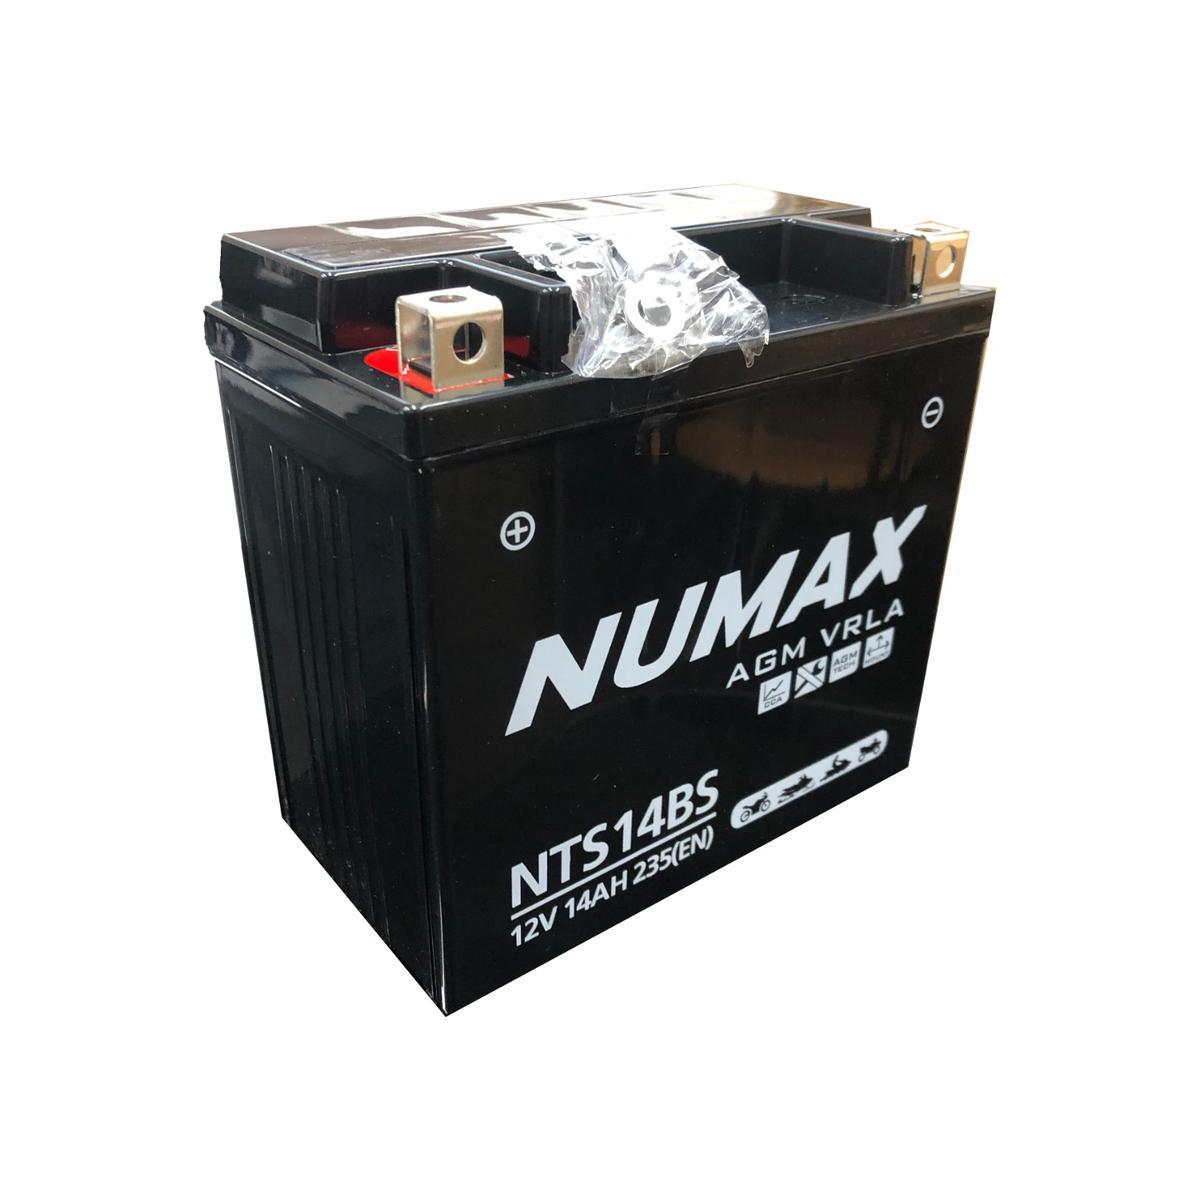 Numax NTS14BS 12v Motorbike Bike Battery KAWASAKI 1100cc GPZ1100 E1 YTX14-4